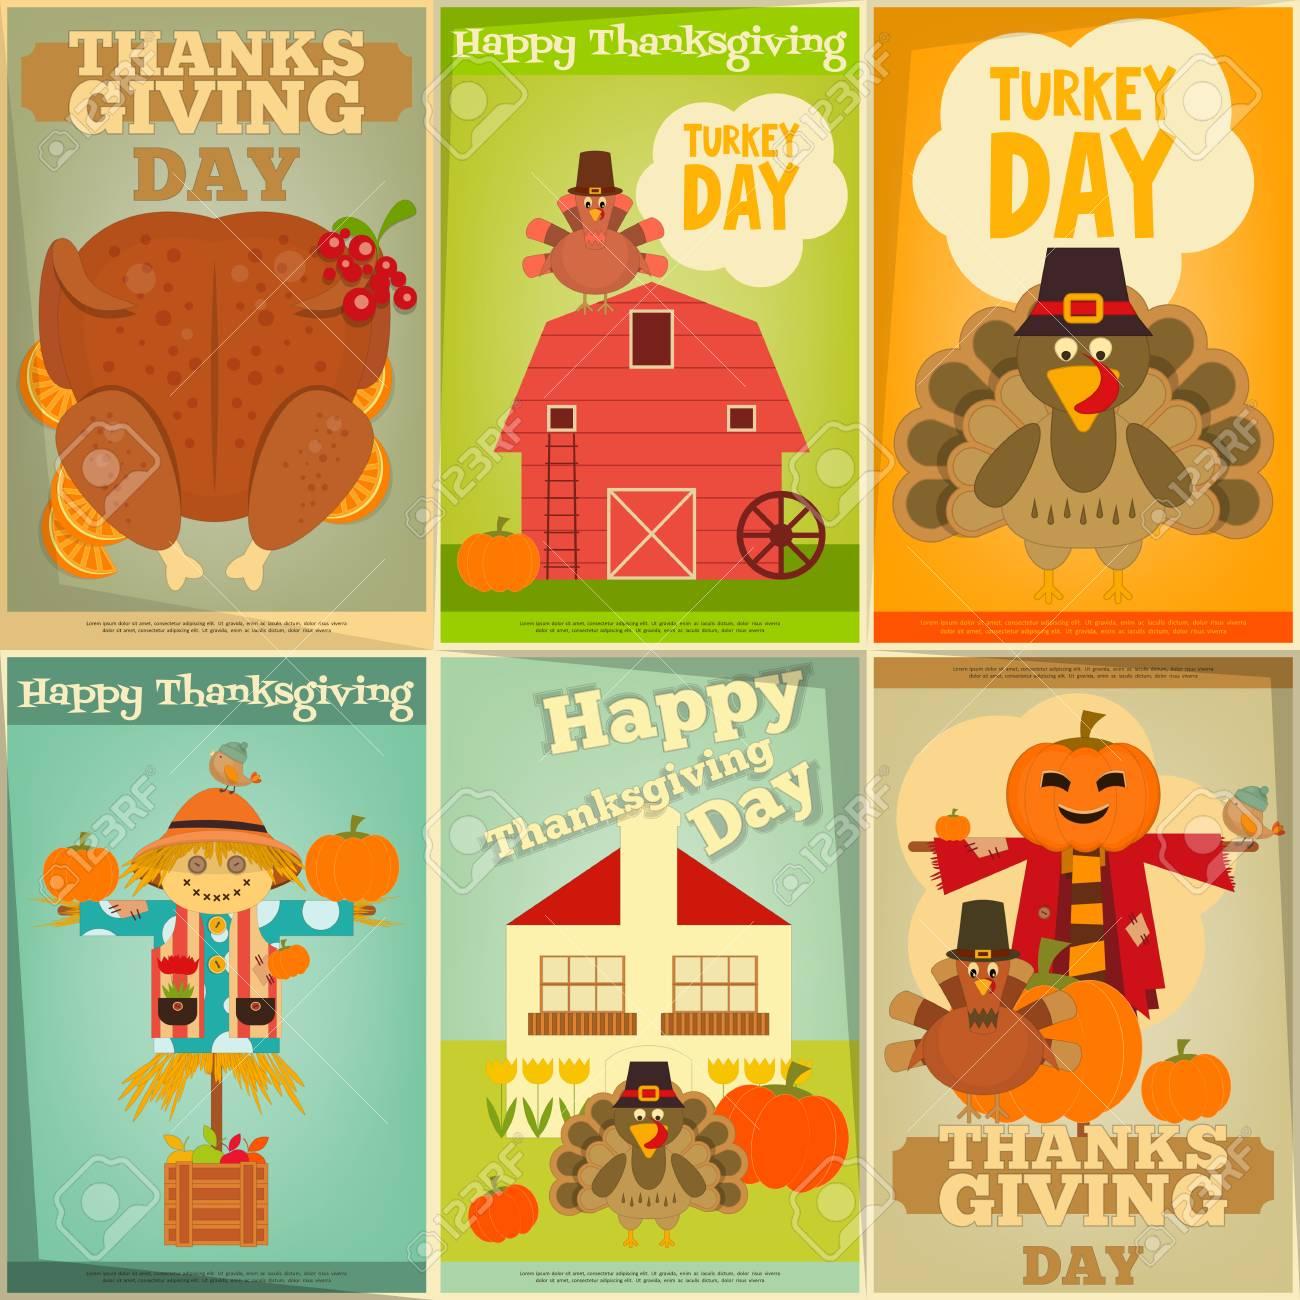 Happy Thanksgiving Greeting Card Set Of Vintage Turkey Day Mini